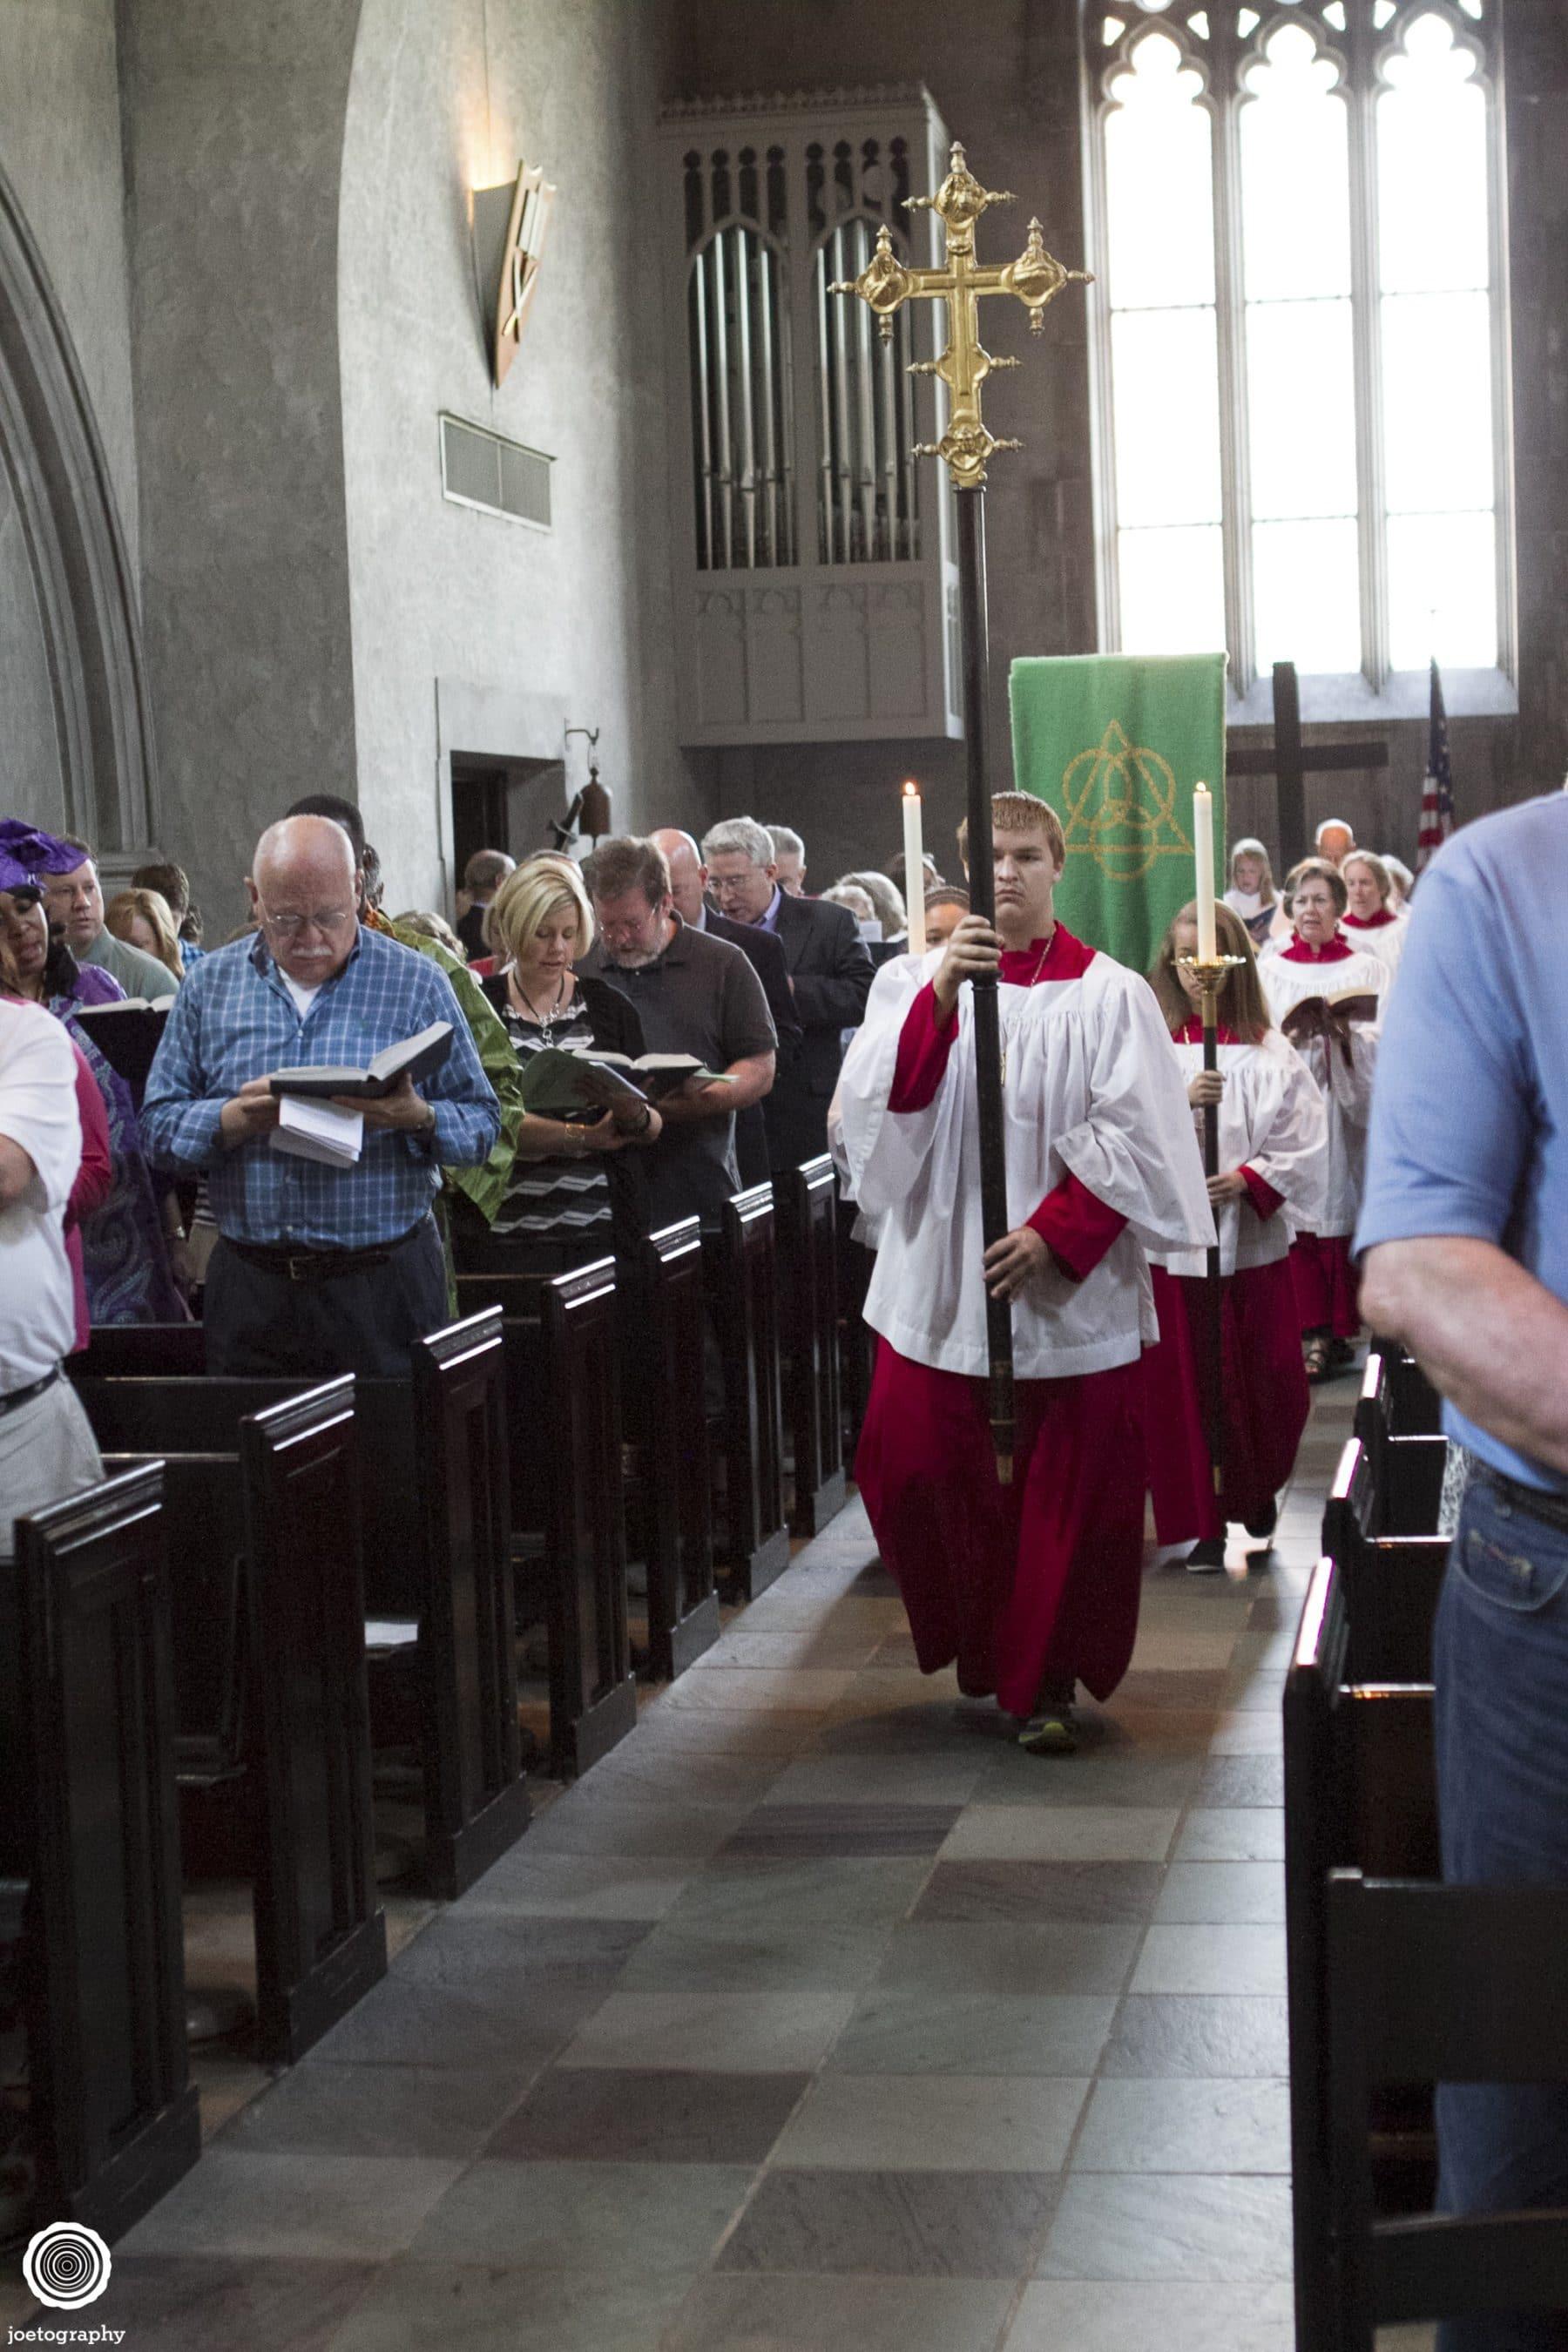 trinity-episcopal-church-indianapolis-79